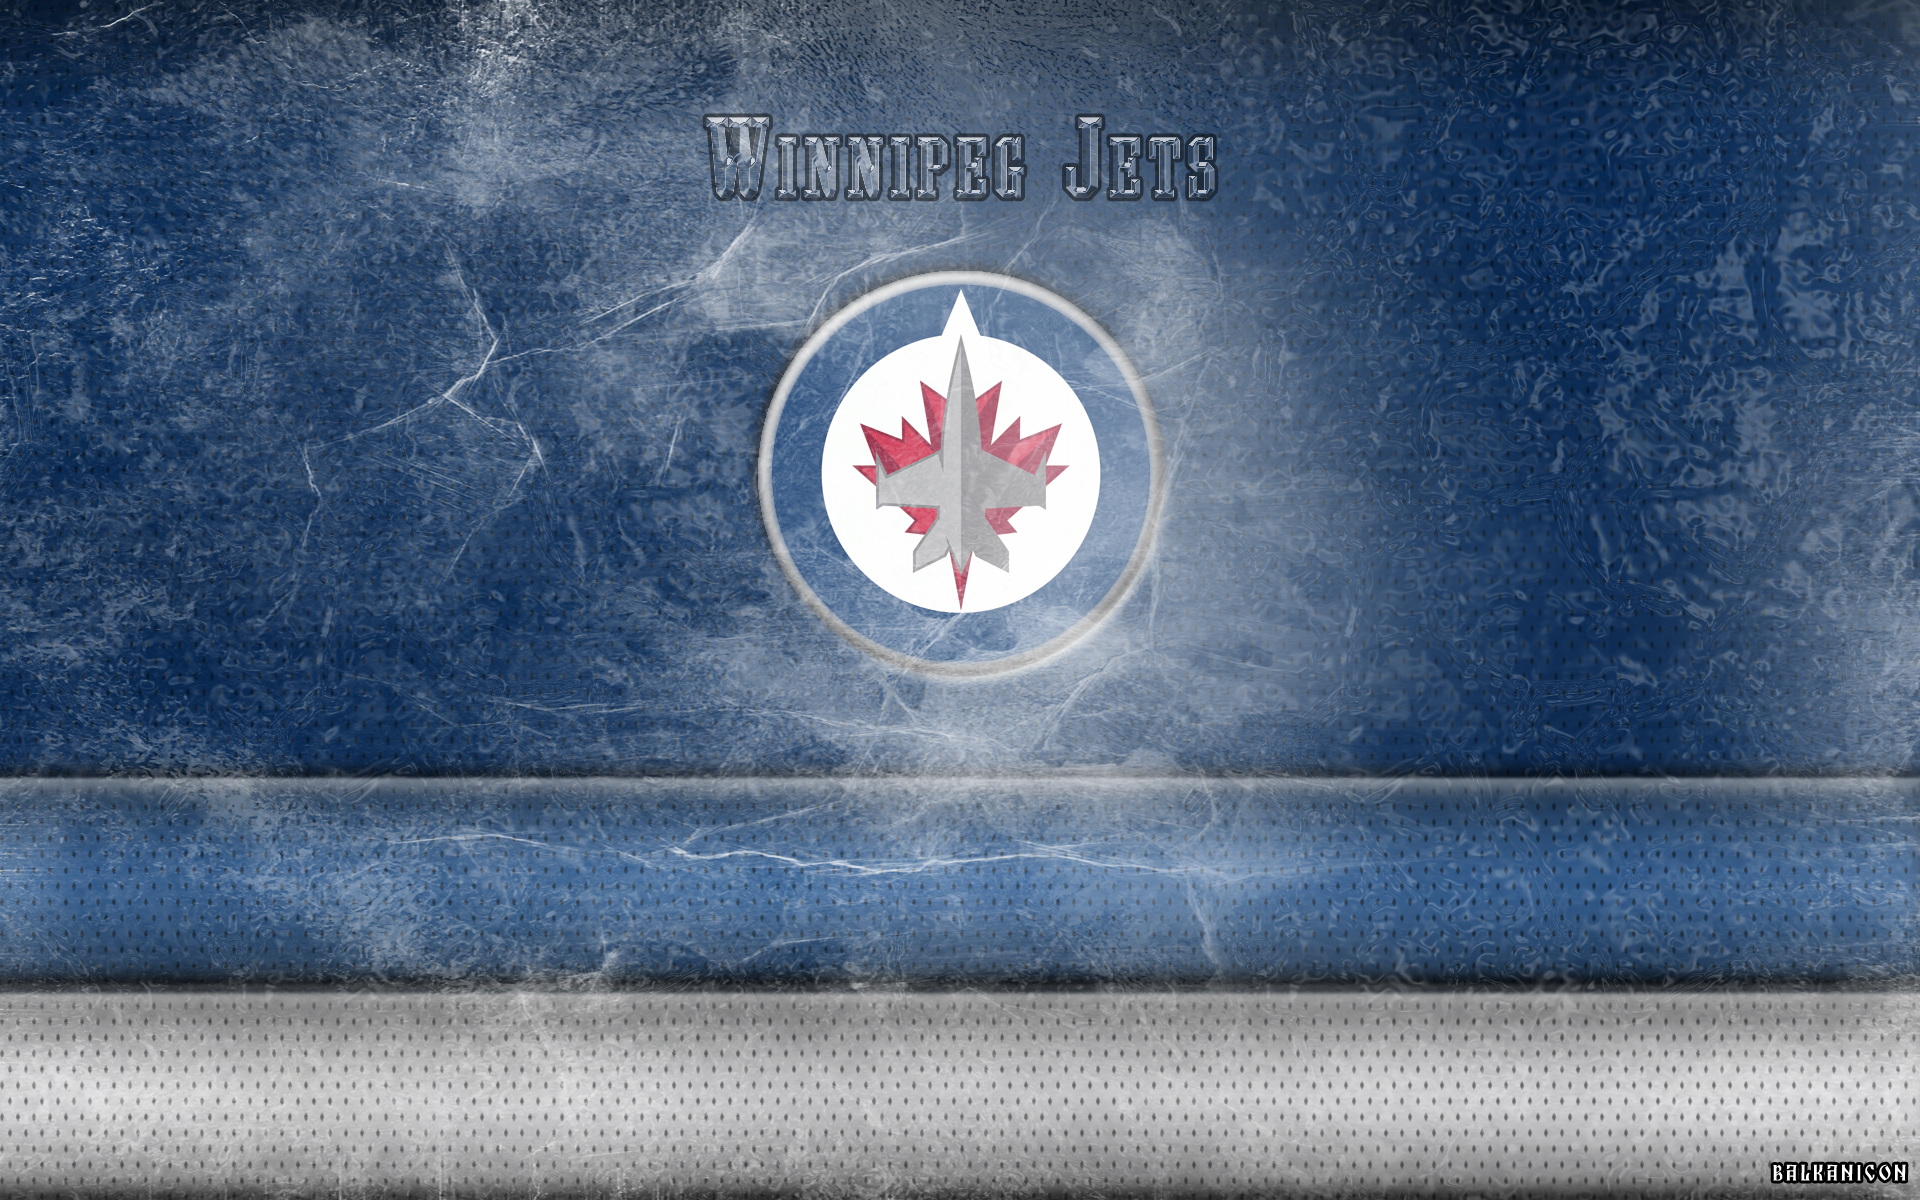 Winnipeg Jets Wallpapers Desktop 1920x1200 px   4USkY 1920x1200